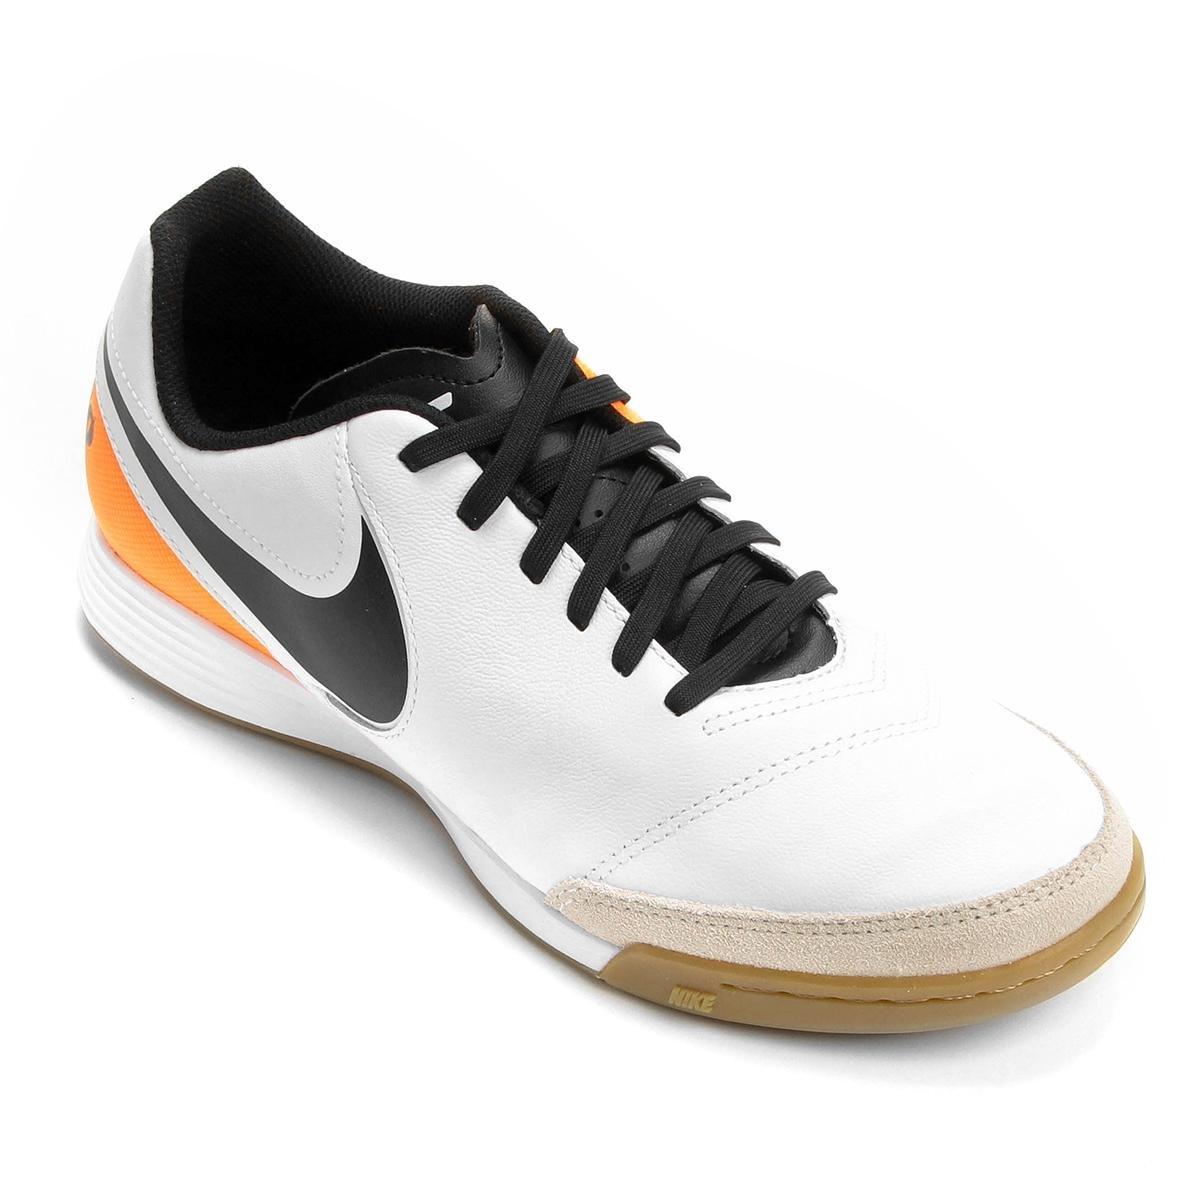 fedbd7b5ab Chuteira Futsal Nike Tiempo Genio 2 Leather IC Masculina - Compre ...